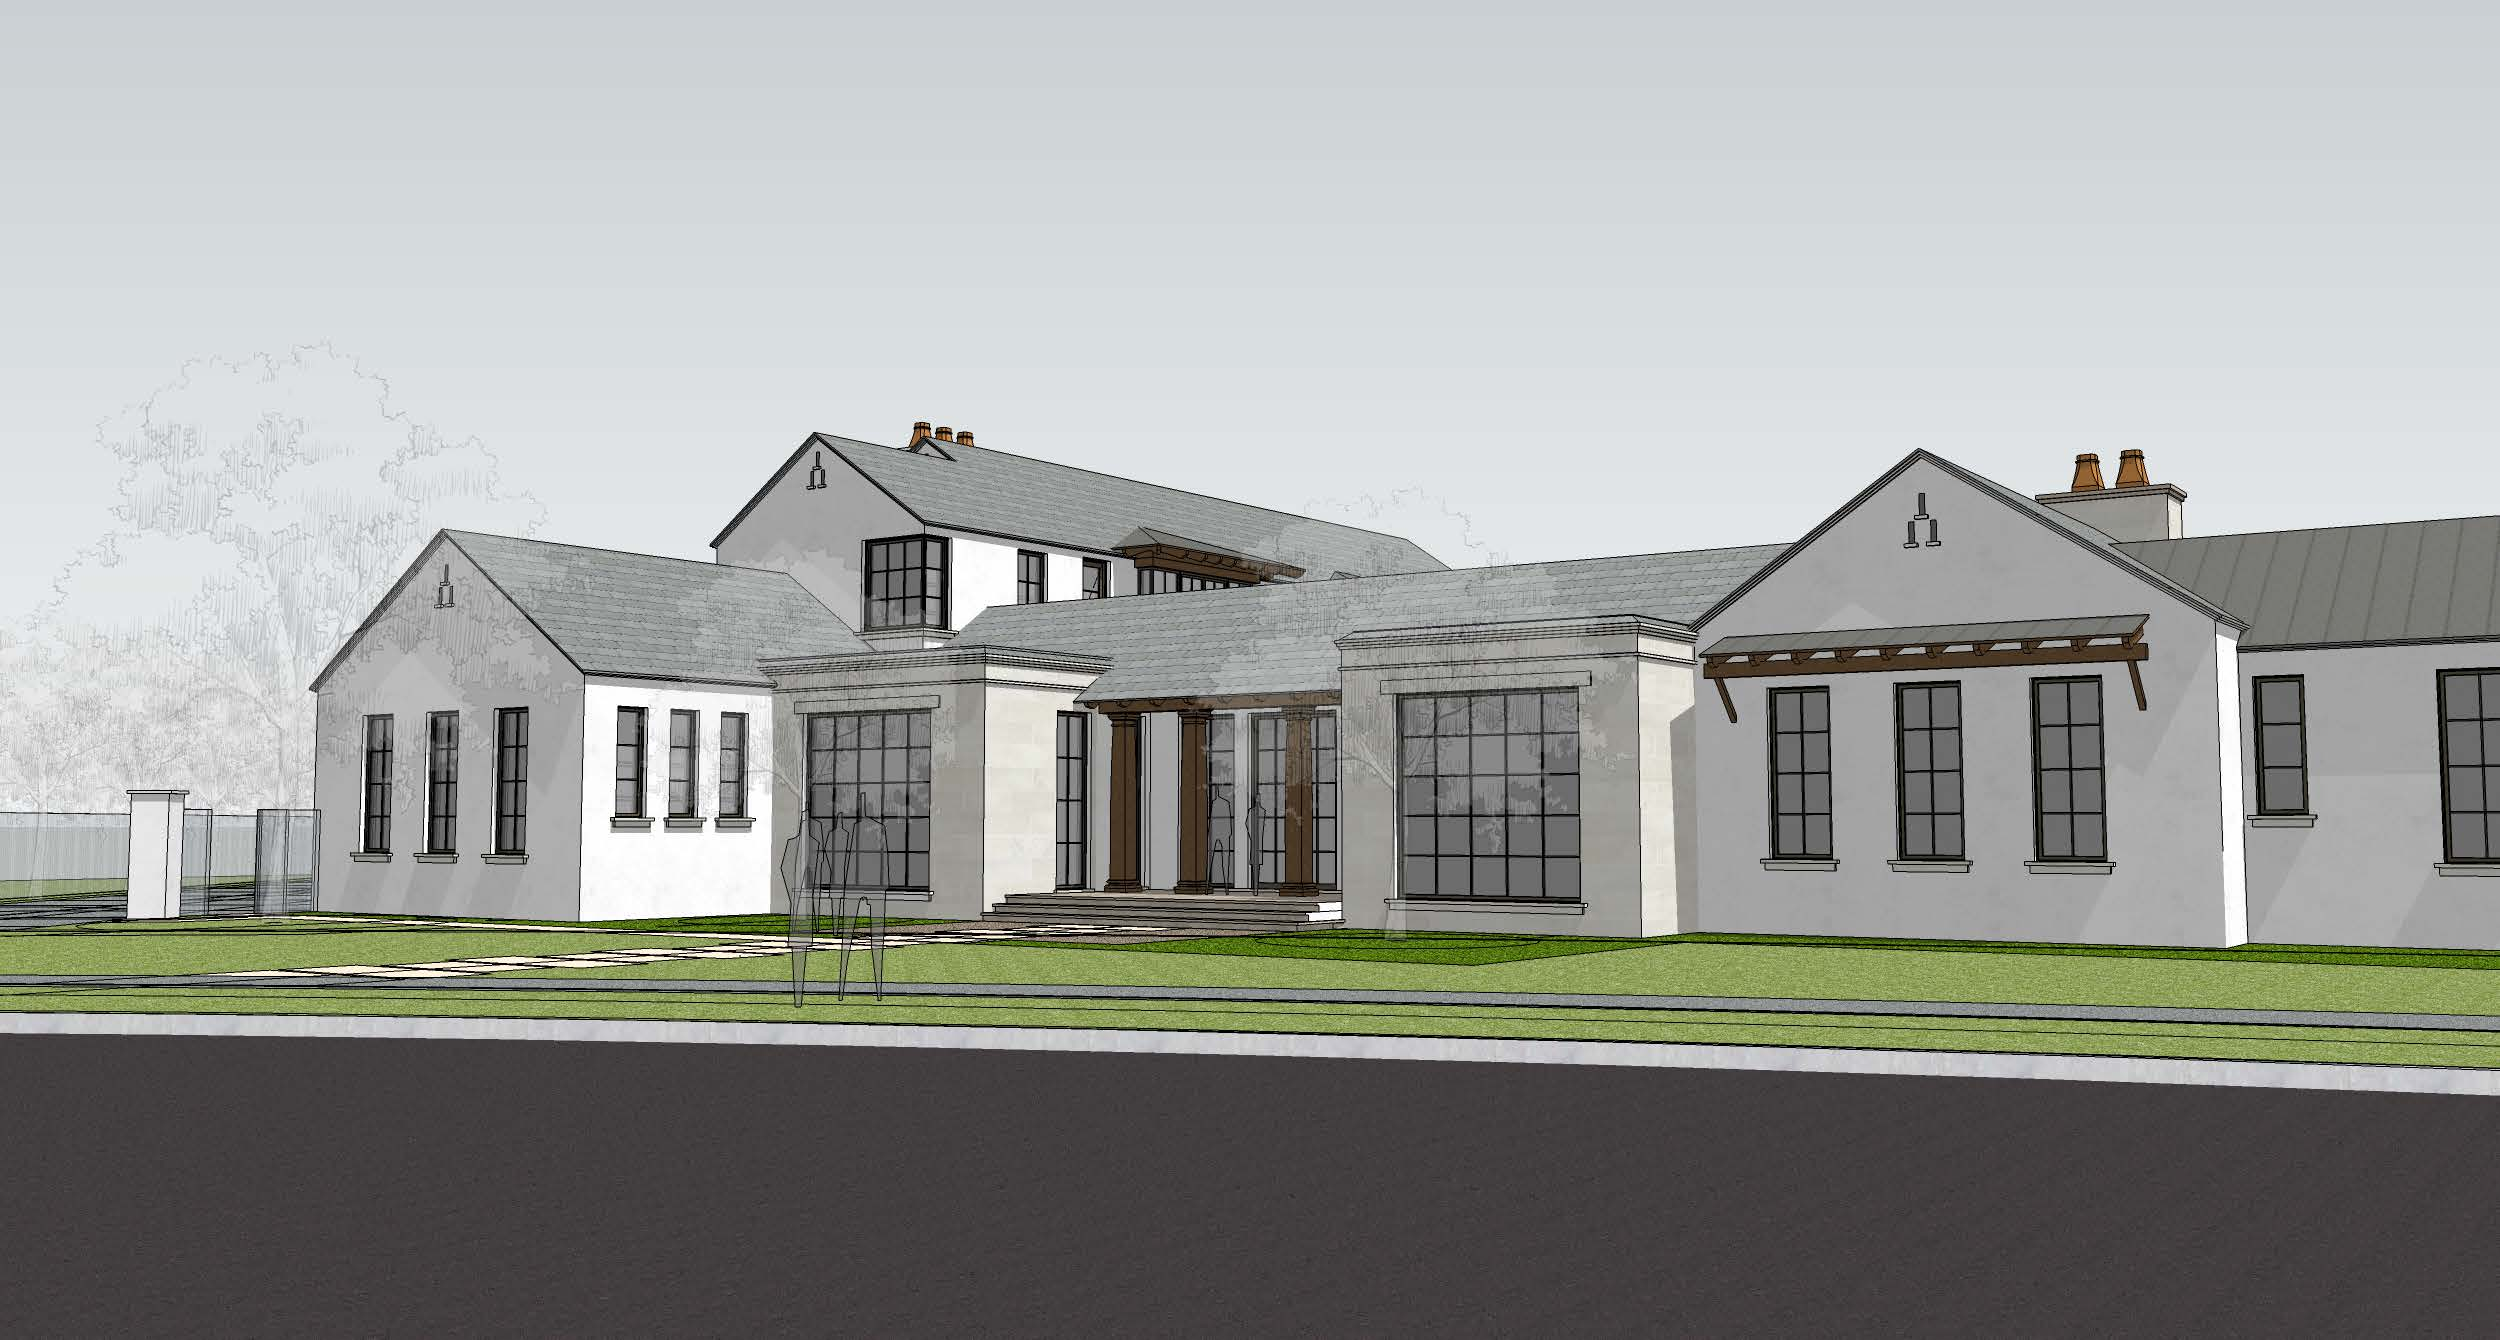 17-080_Vyas Residence_Model Views_Design Review_Page_5.jpg